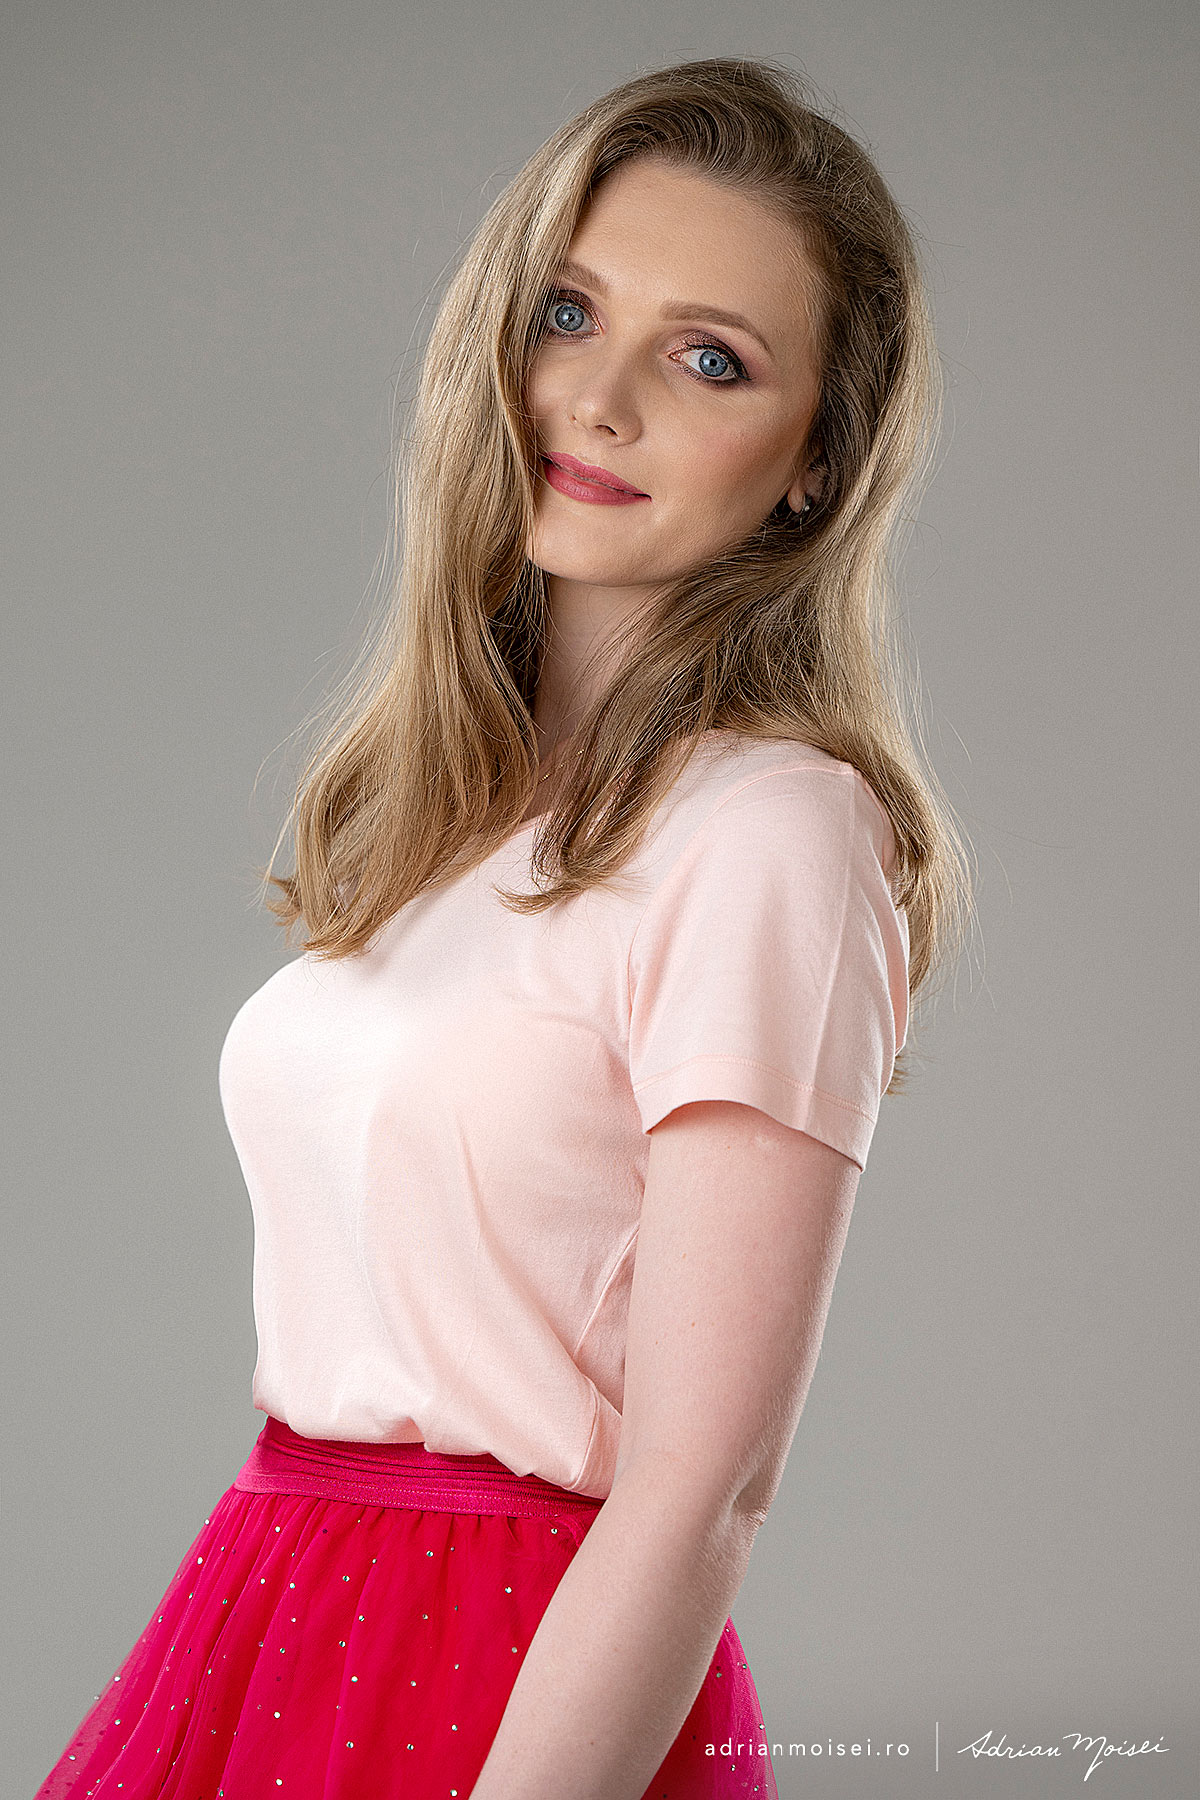 Fotograf Iasi - studio foto-video - fotografie fashion - beauty - portret - Adrian Moisei. Olga de la Atelier Motaniq